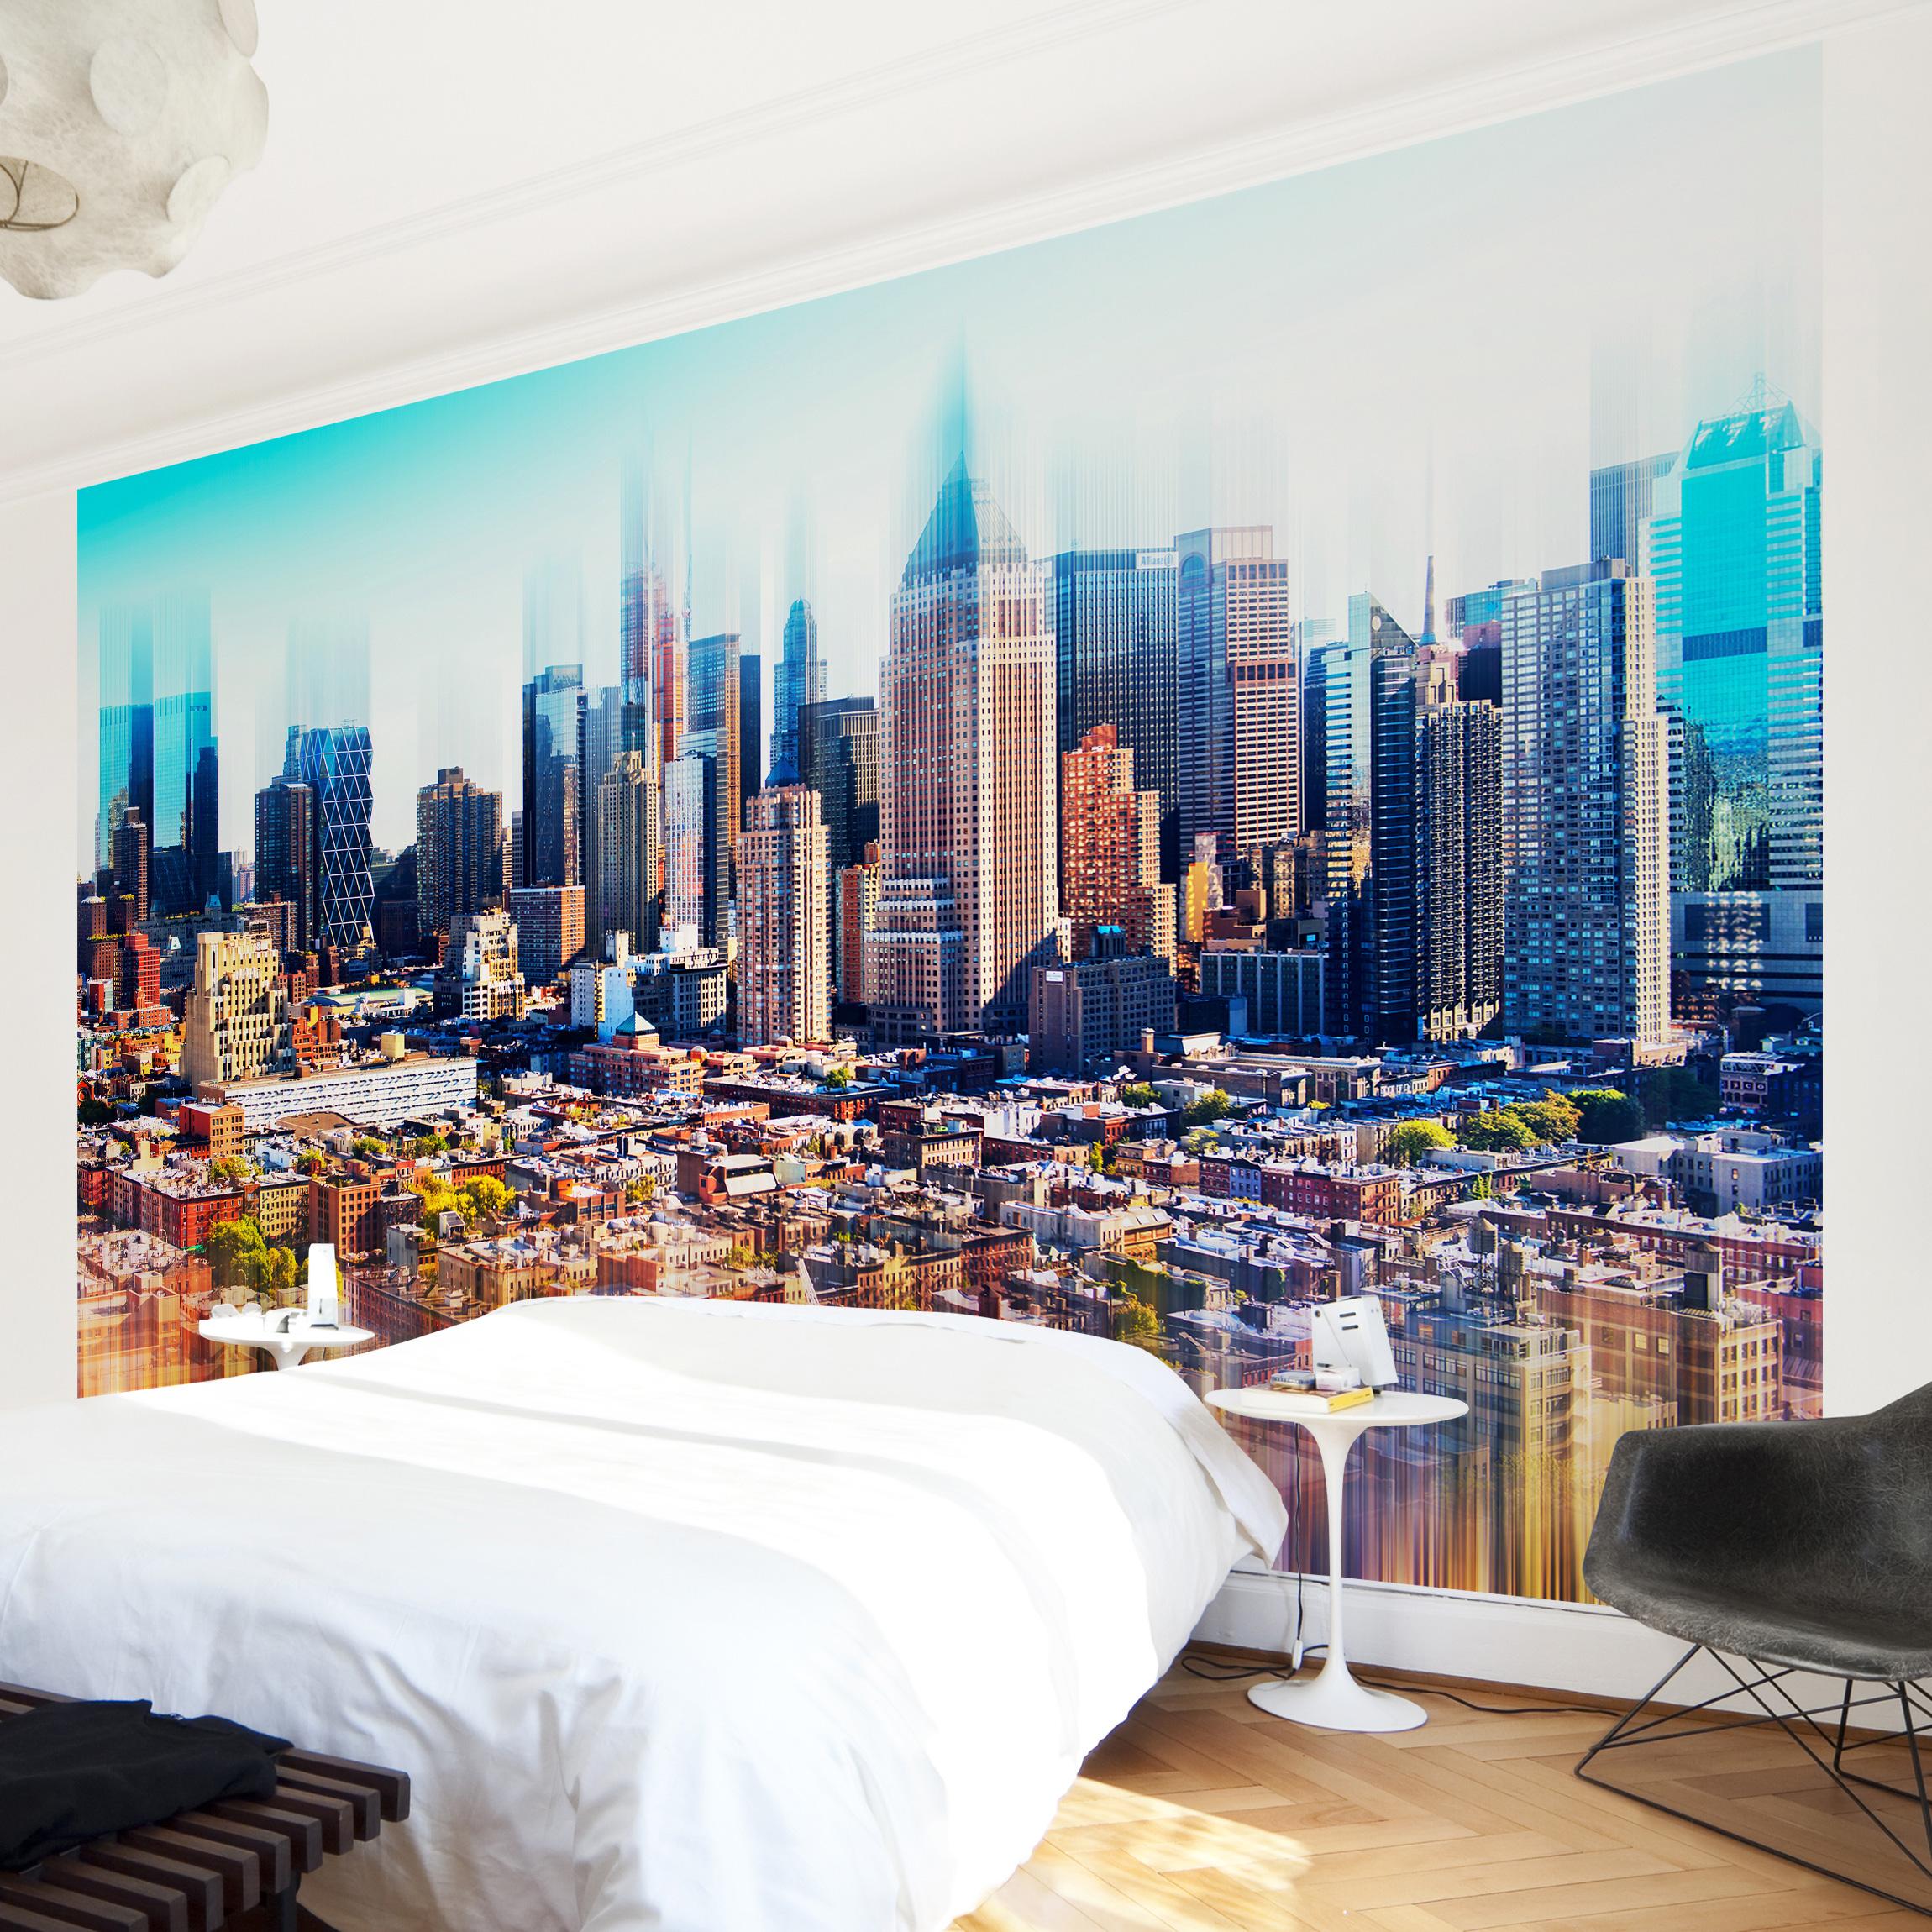 new york fototapete selbstklebend manhattan skyline urban stretch. Black Bedroom Furniture Sets. Home Design Ideas